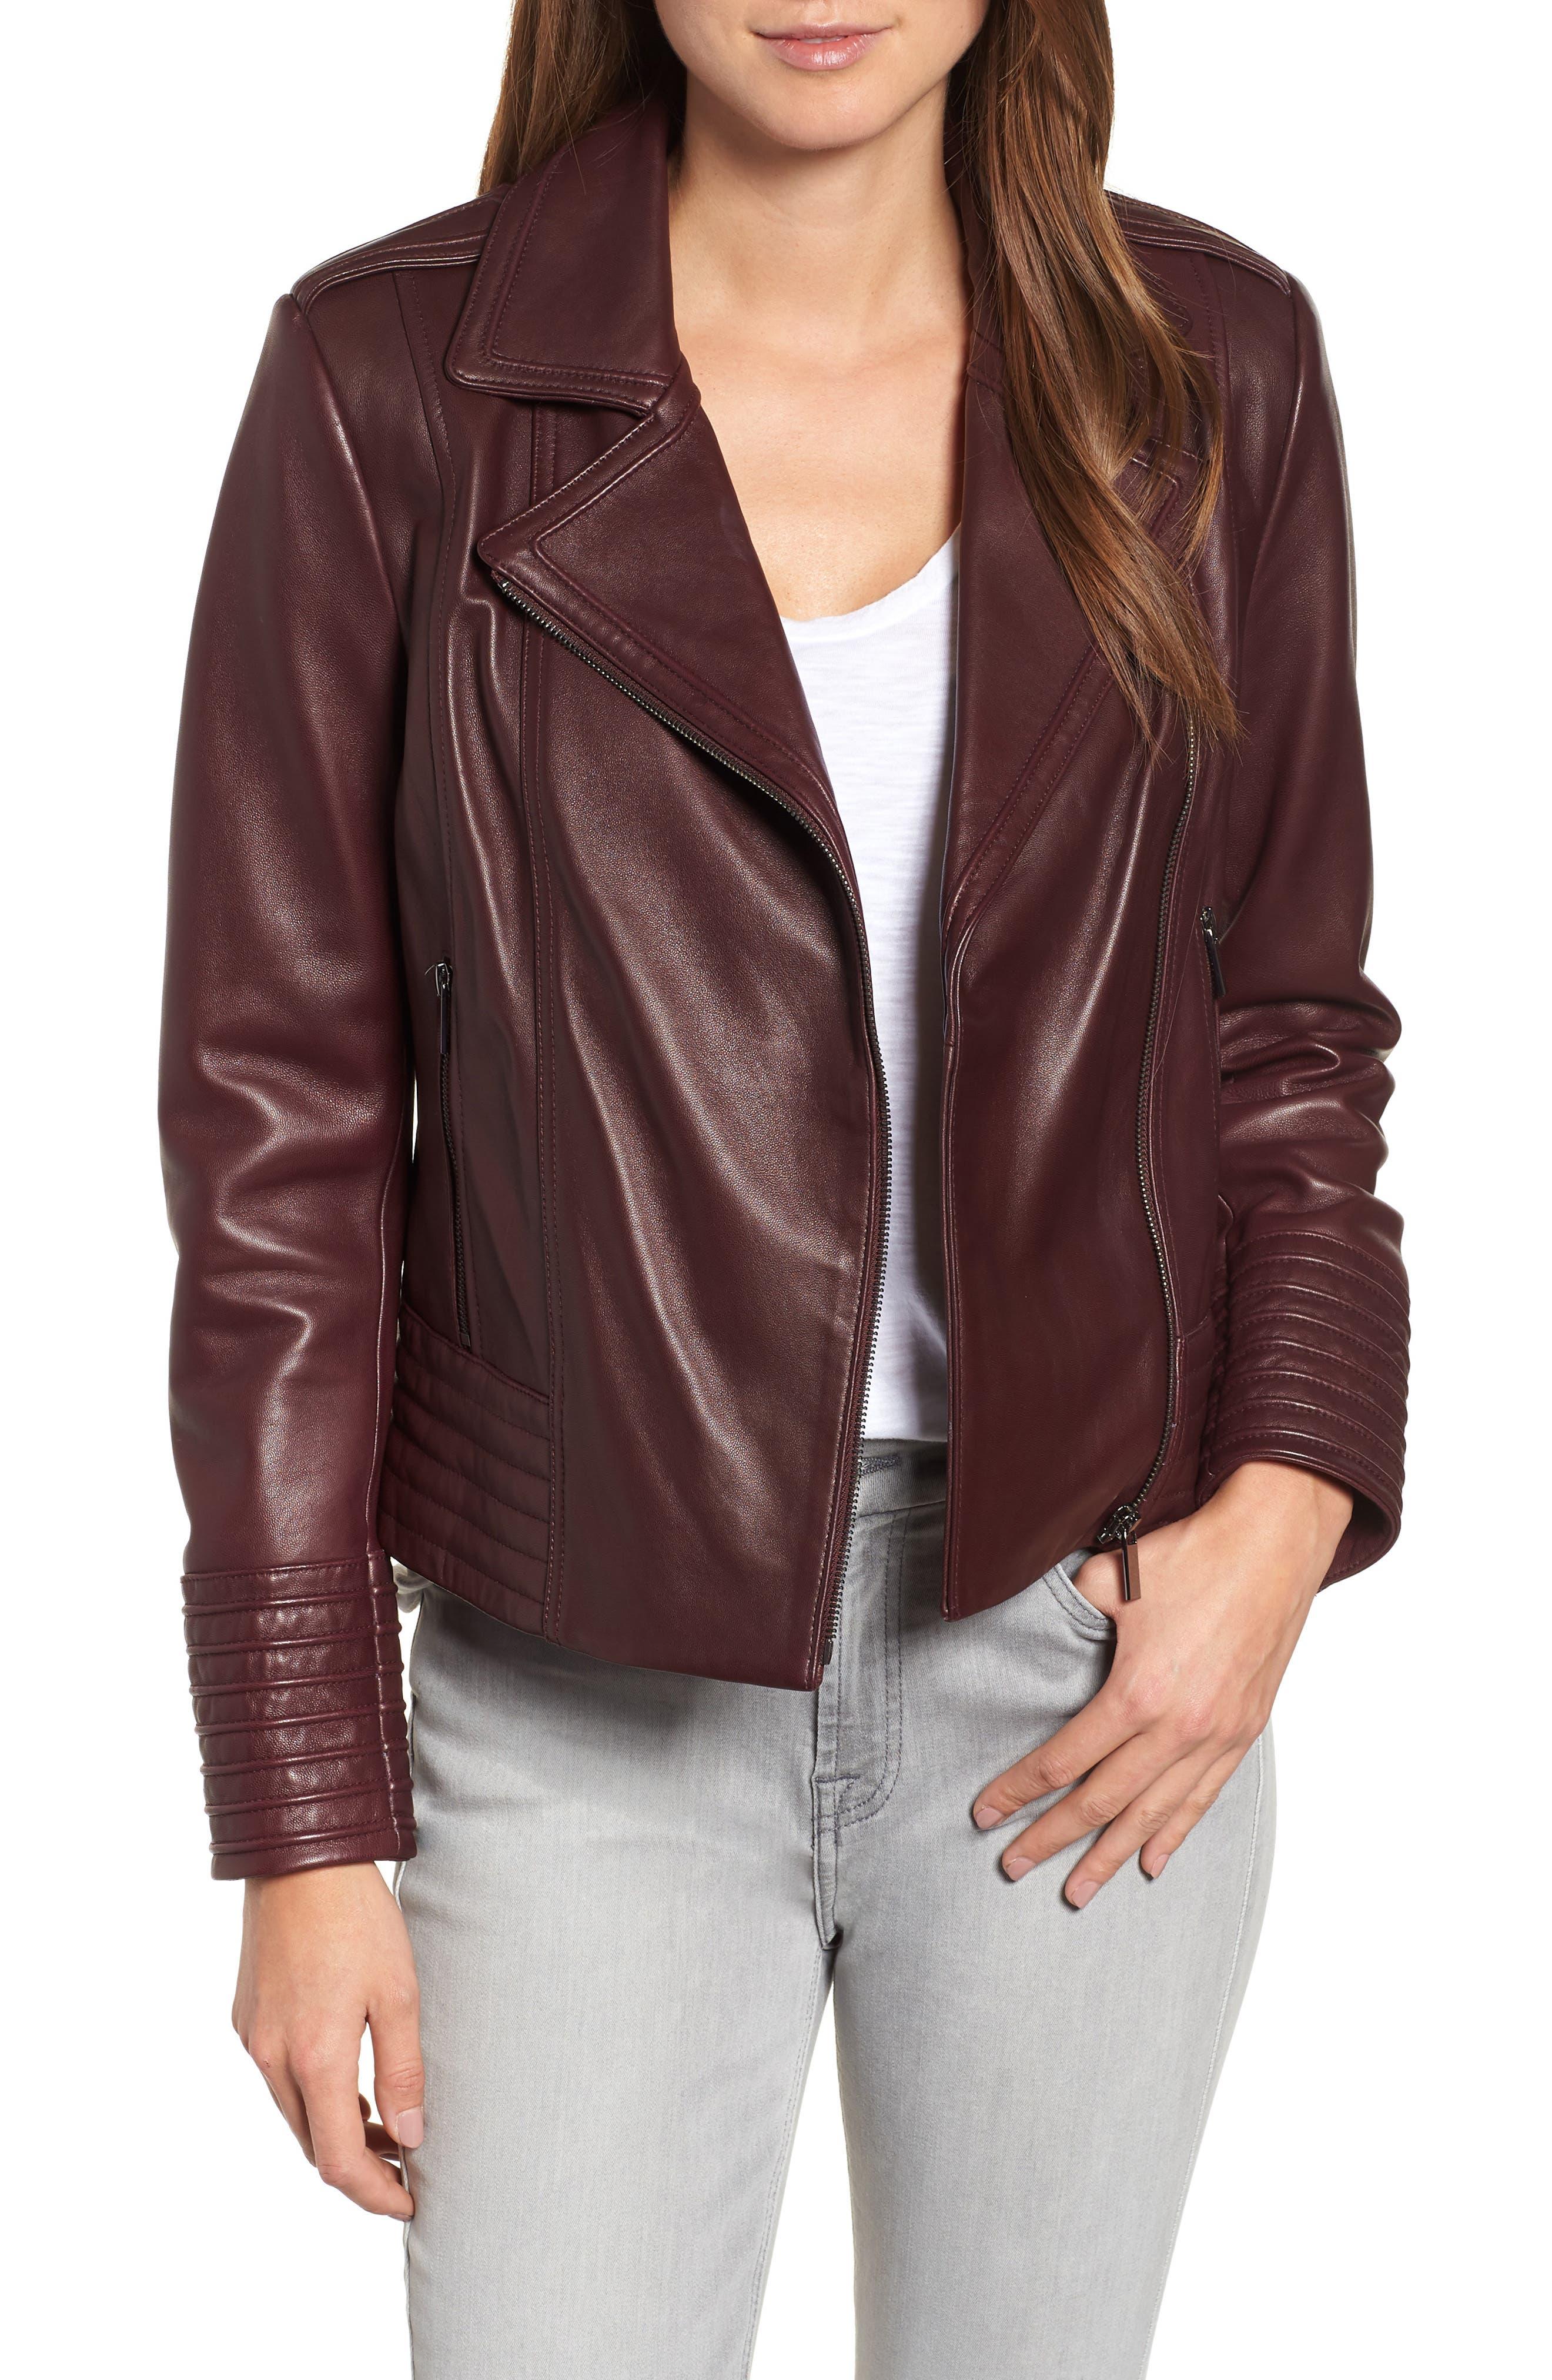 Gia Leather Biker Jacket,                             Main thumbnail 1, color,                             Burgundy